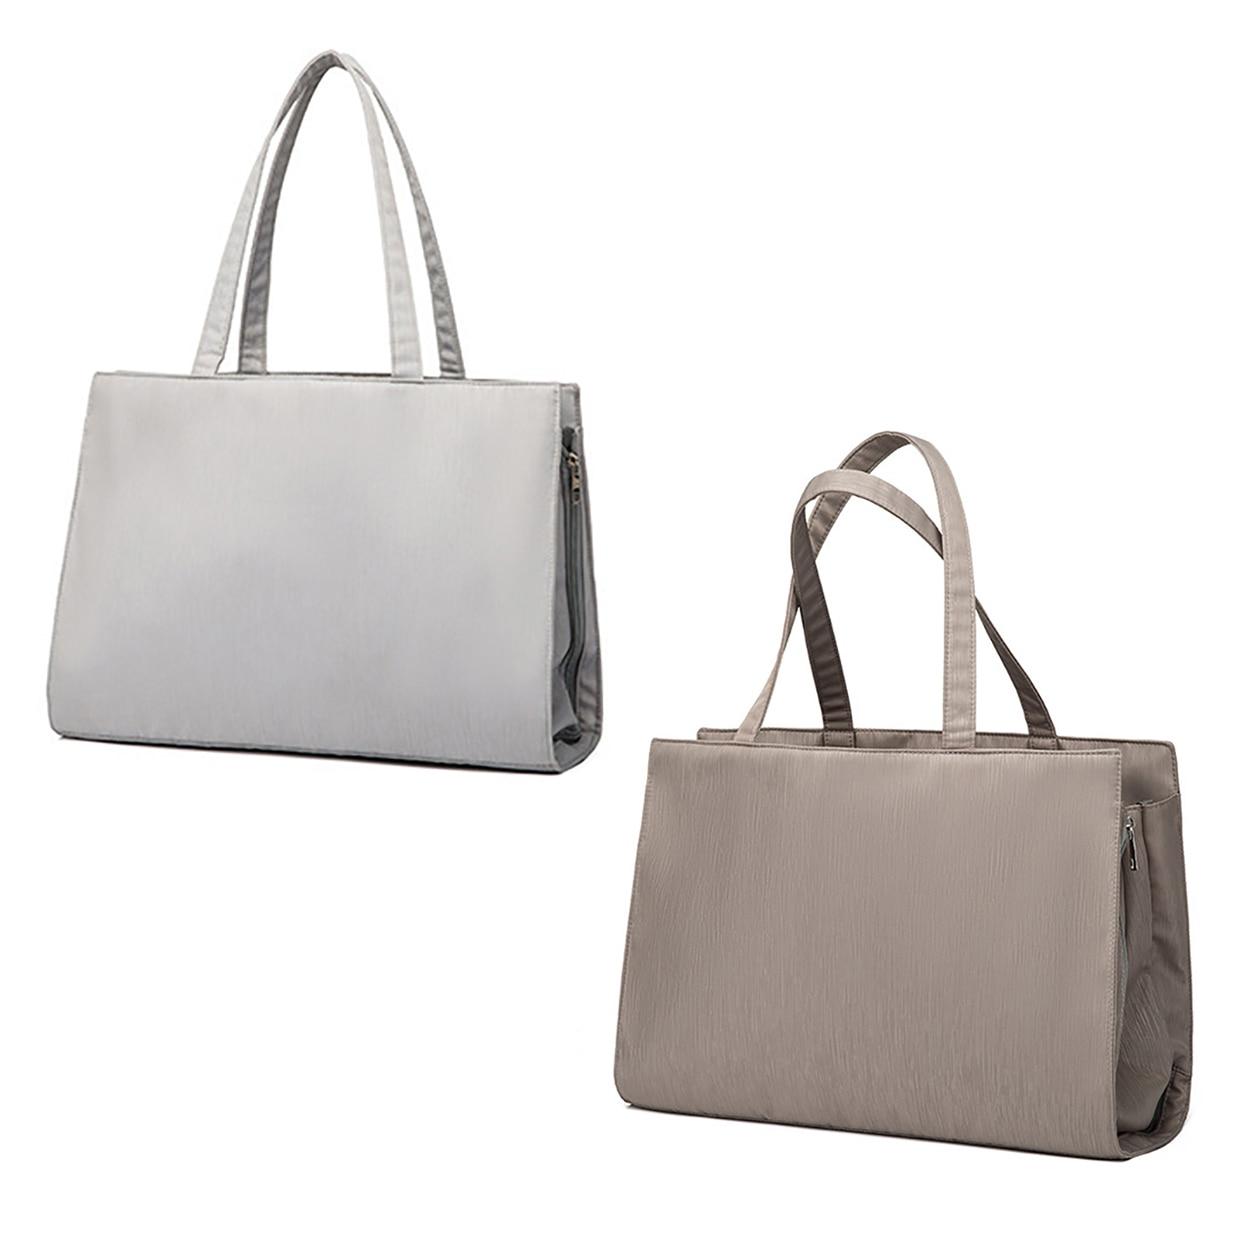 Large Capacity Diaper Bag Backpack Multifunctional Baby Bed Bag Maternity Nursing Handbag Stroller Bag Mummy Nappy Bag